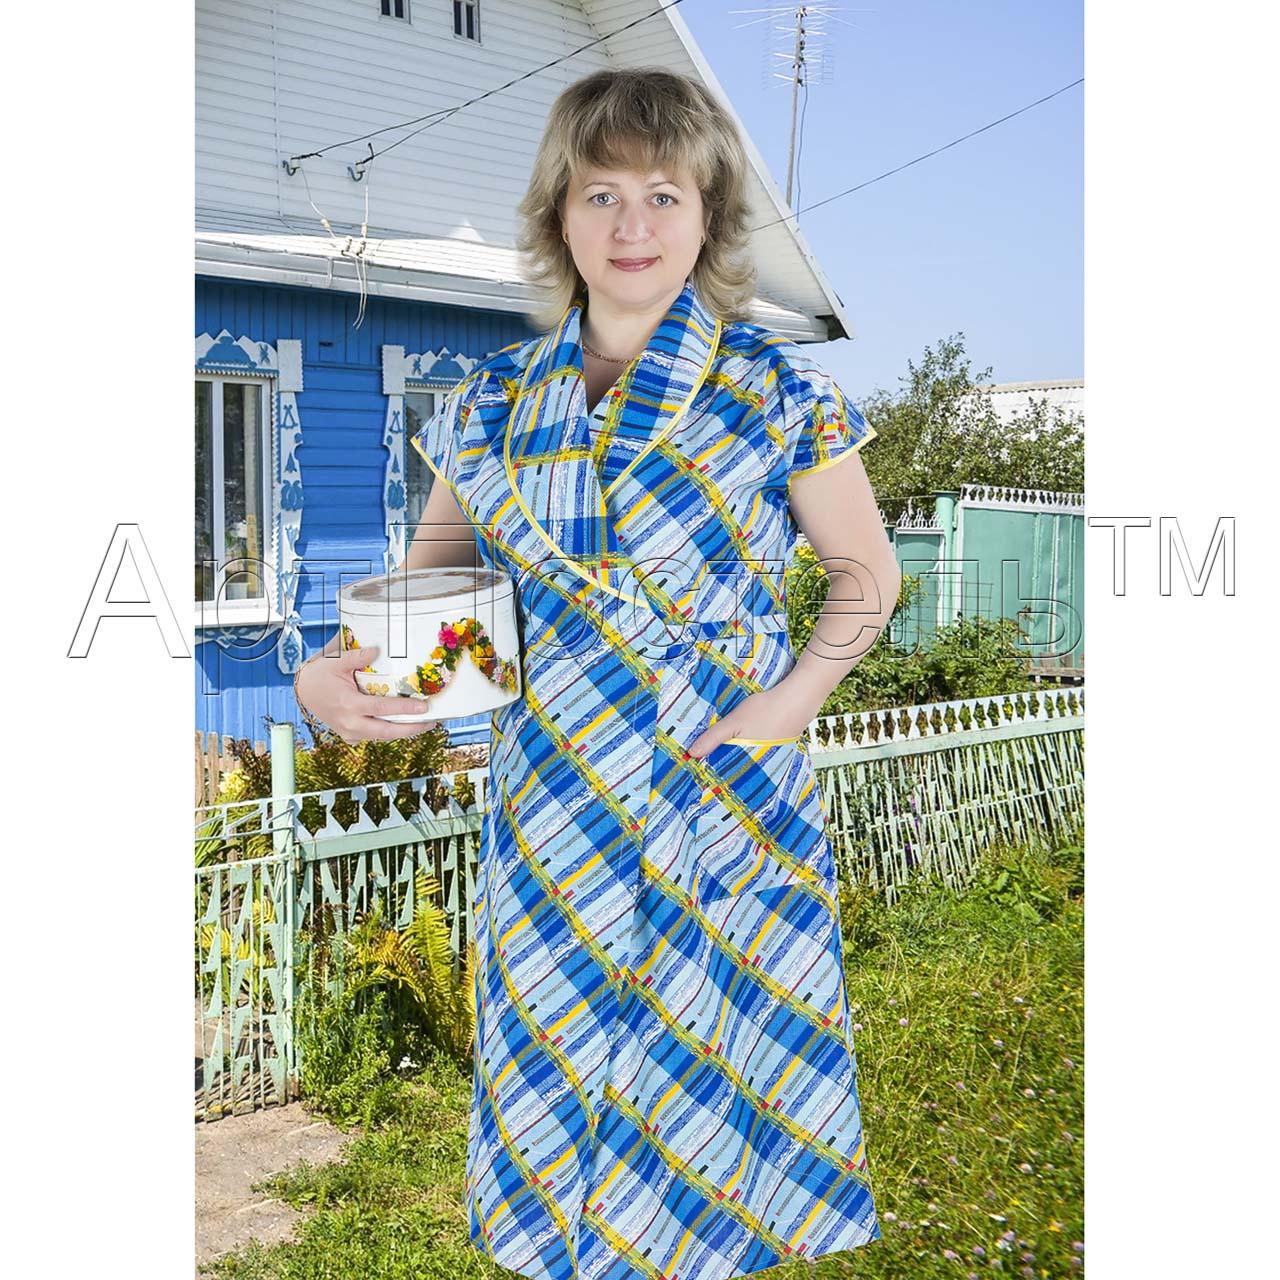 Женский халат Арлекин запашной, размер 46Халаты<br>Обхват груди:92 см<br>Обхват талии:73 см<br>Обхват бедер:100 см<br>Рост:164-170 см<br><br>Тип: Жен. халат<br>Размер: 46<br>Материал: Бязь